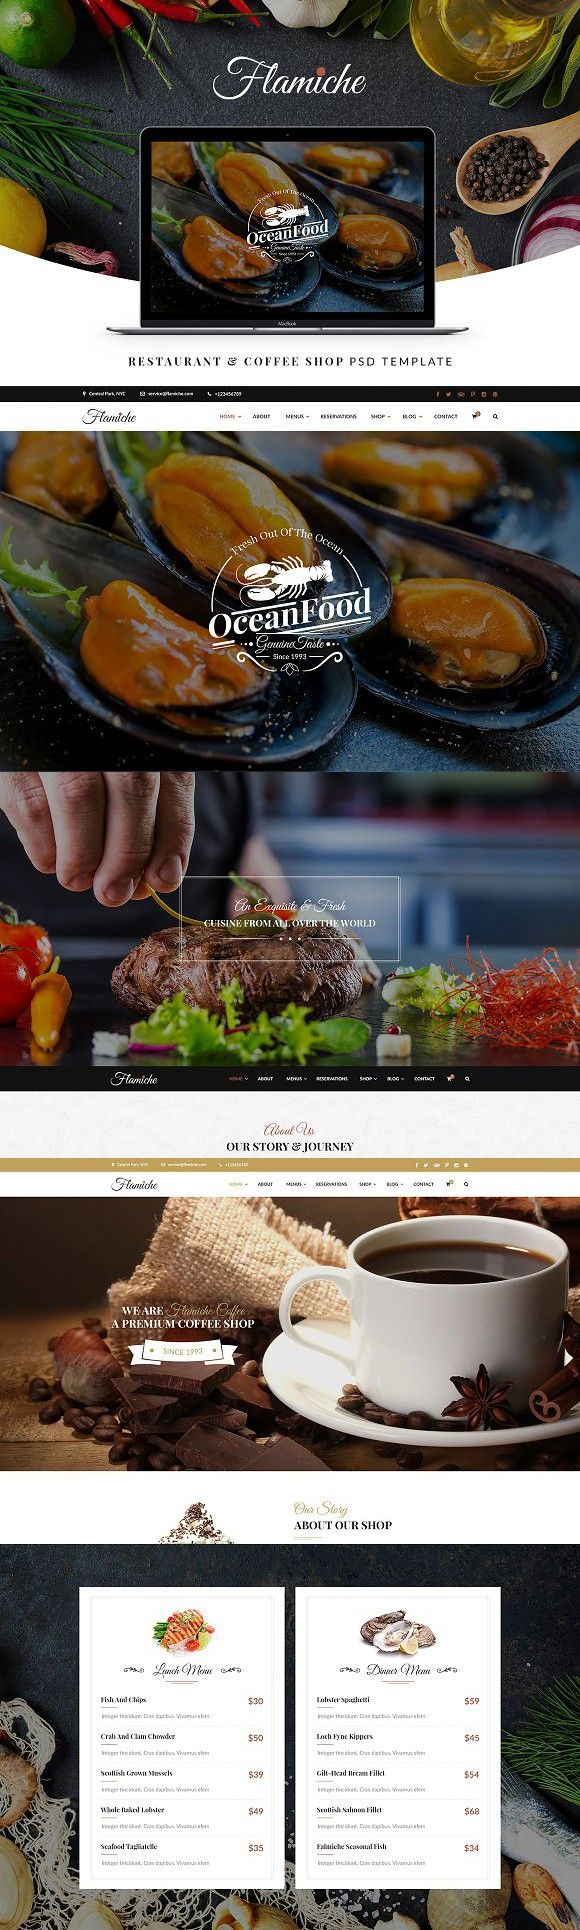 Flamiche - Restaurant PSD Template. Website Templates